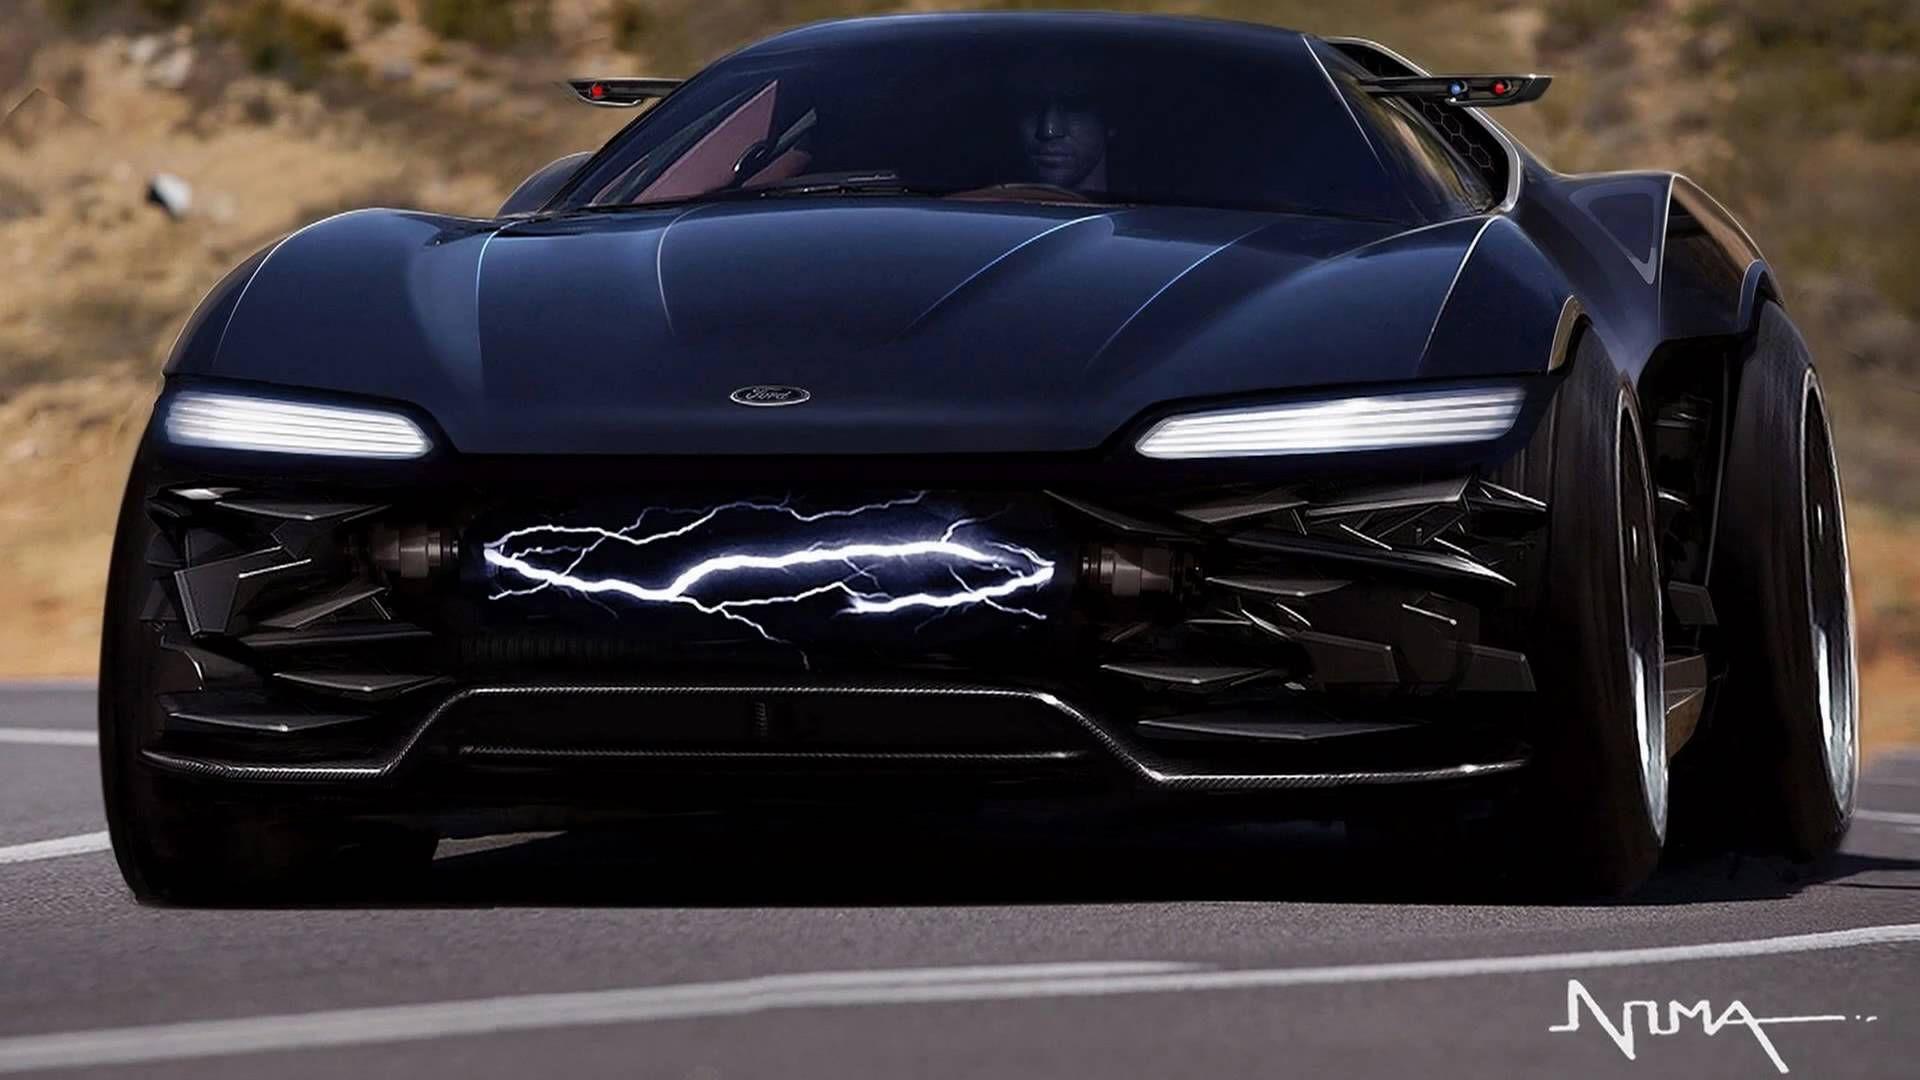 Surface Ford Ranger Max Concept X Future Info Motor Konzeptfahrzeuge Superauto Autosachen